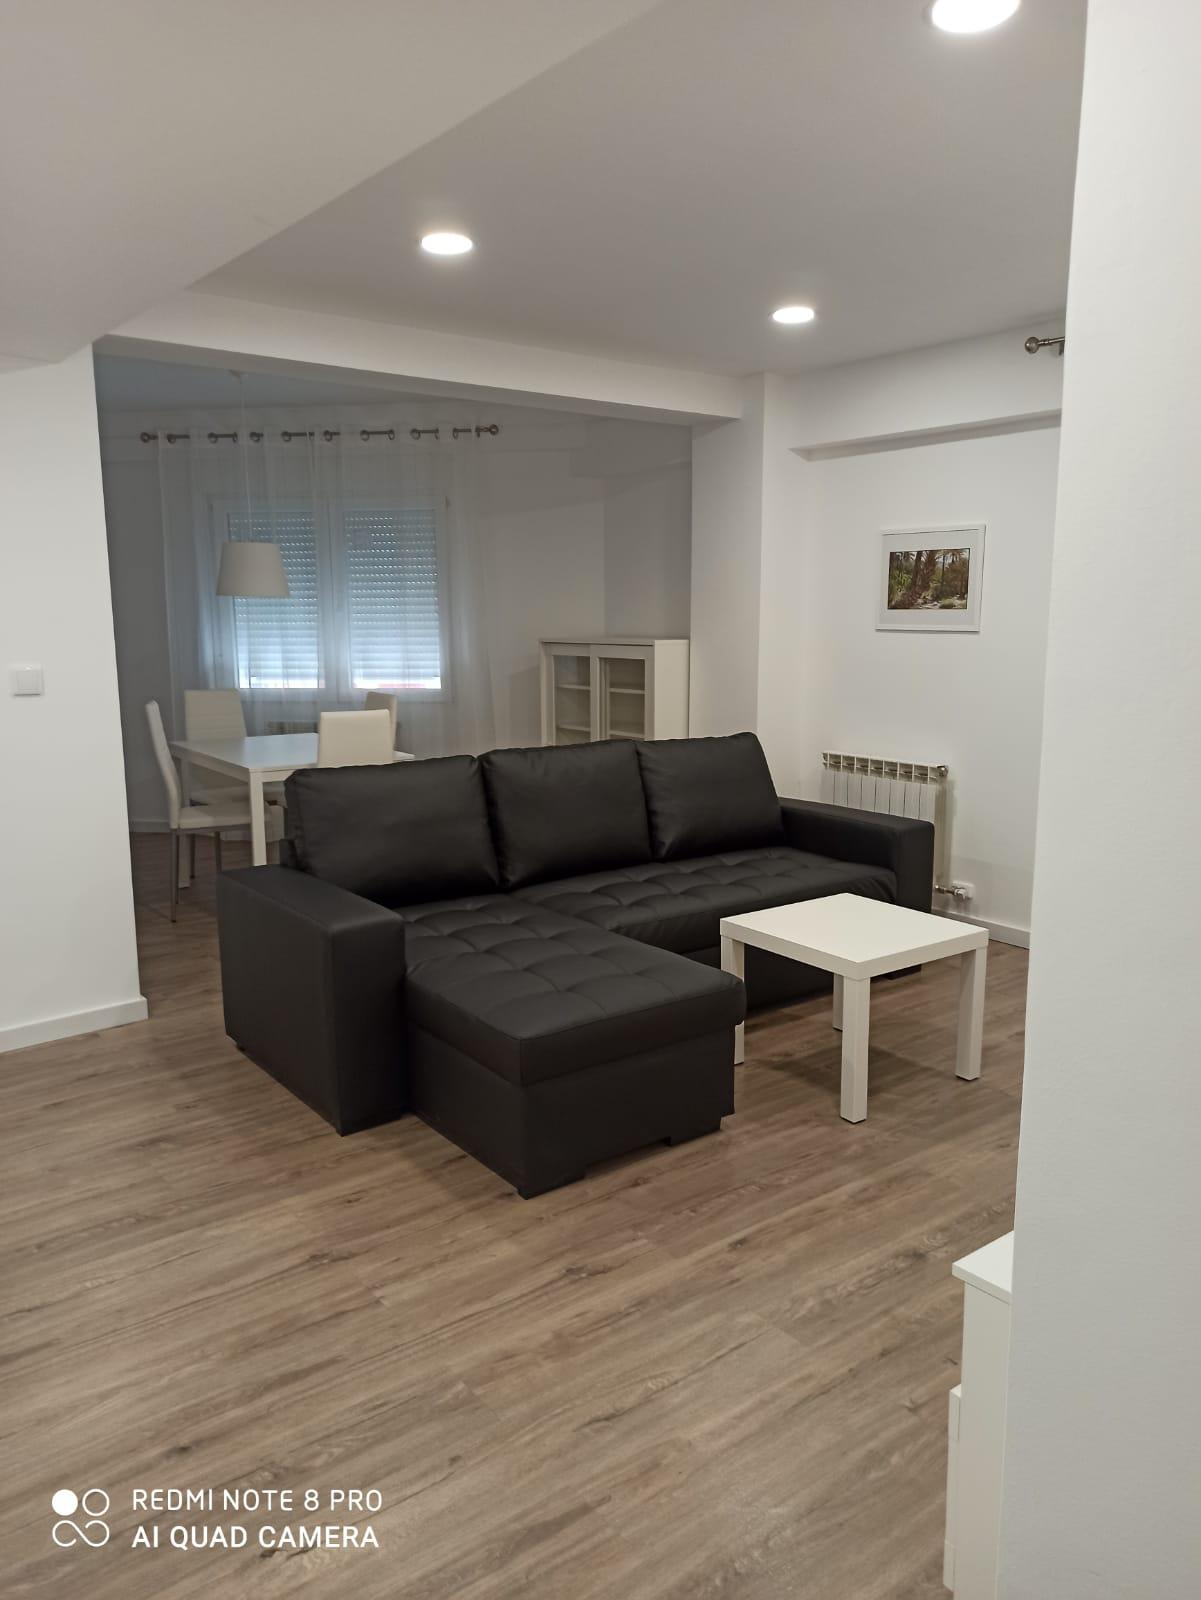 https://publipisoszaragoza.com/listings/alquiler-piso-delicias-zaragoza/